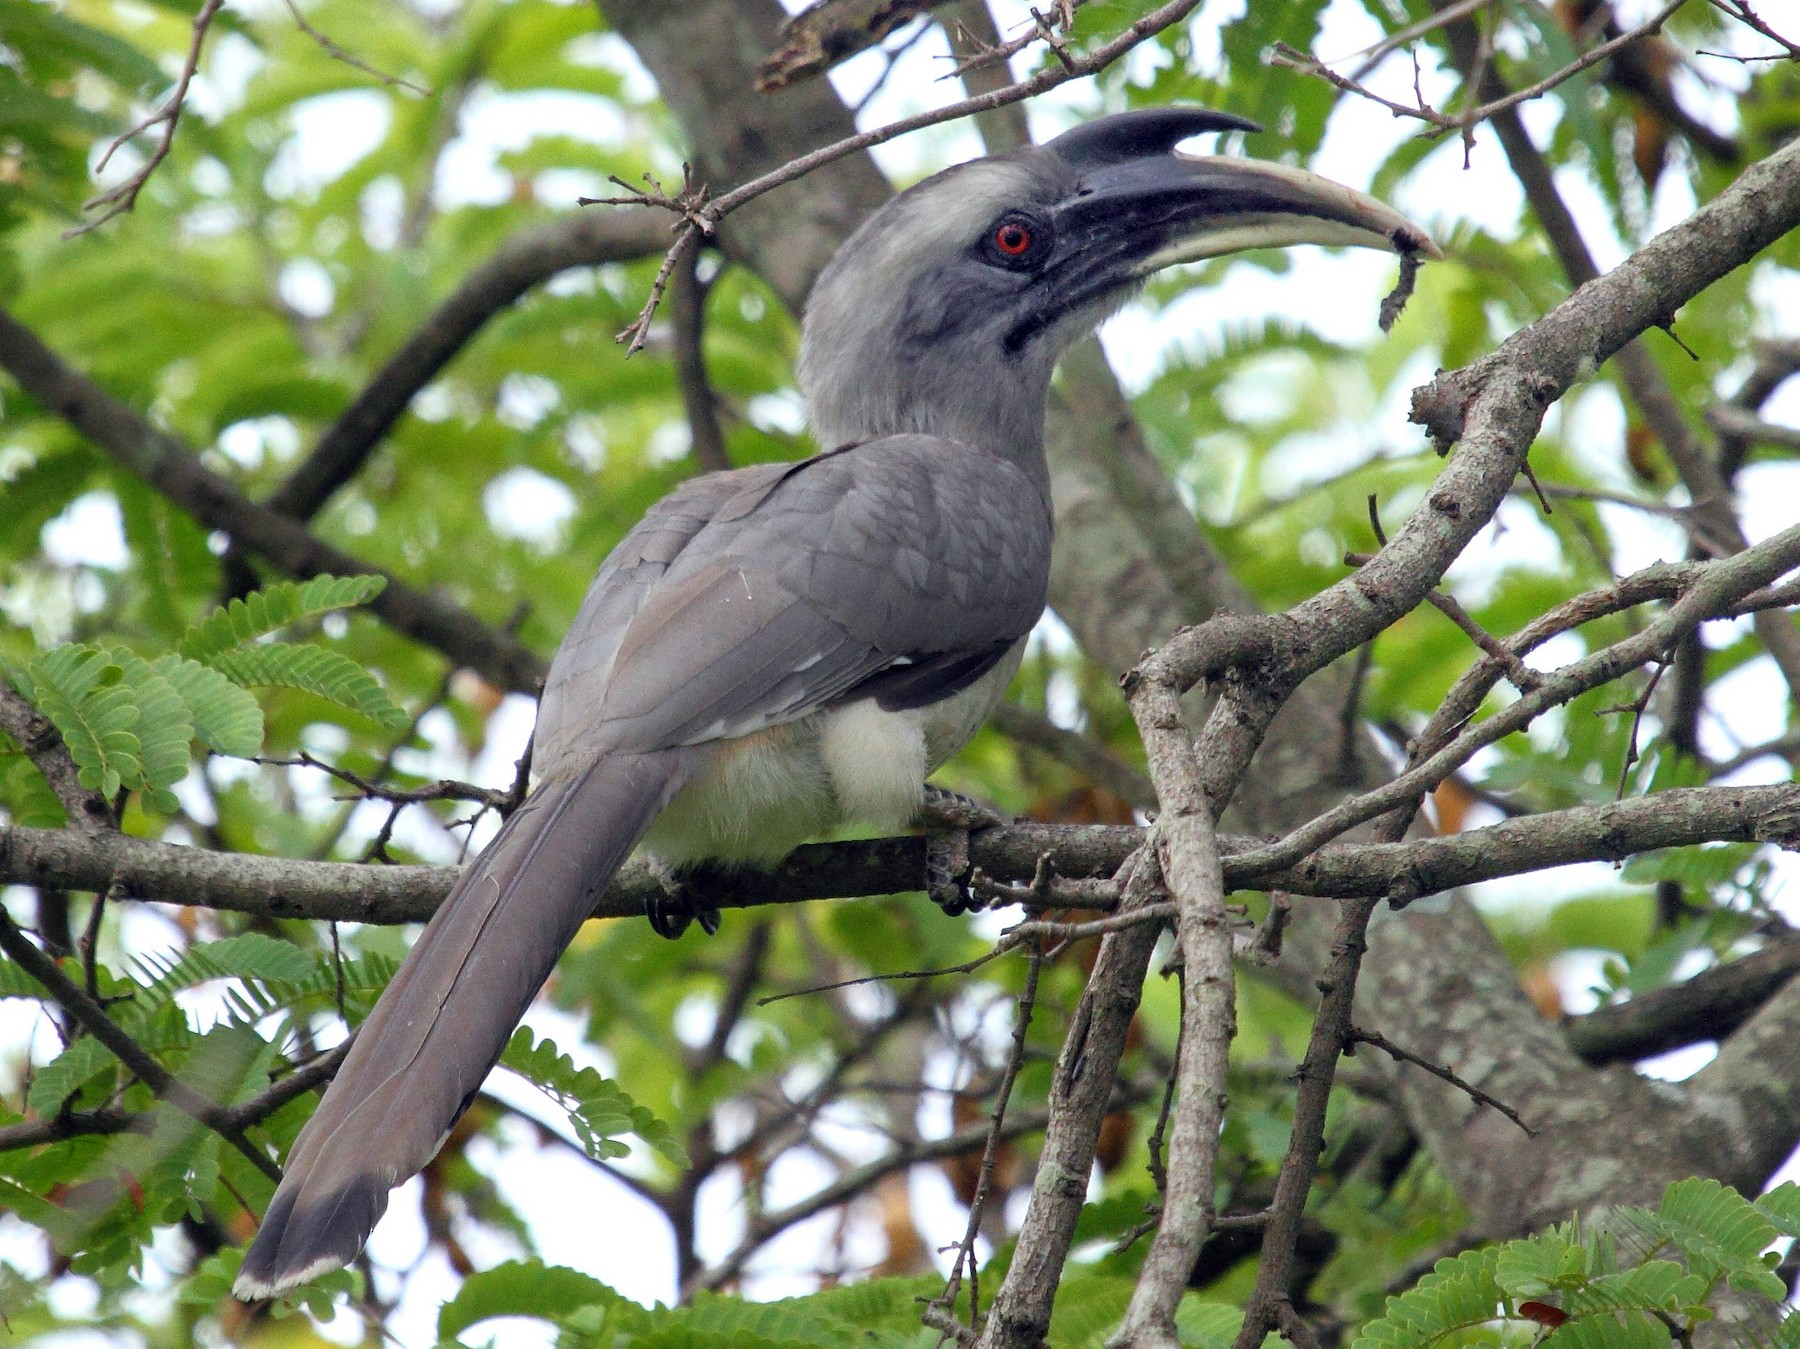 Indian Gray Hornbill - Albin Jacob